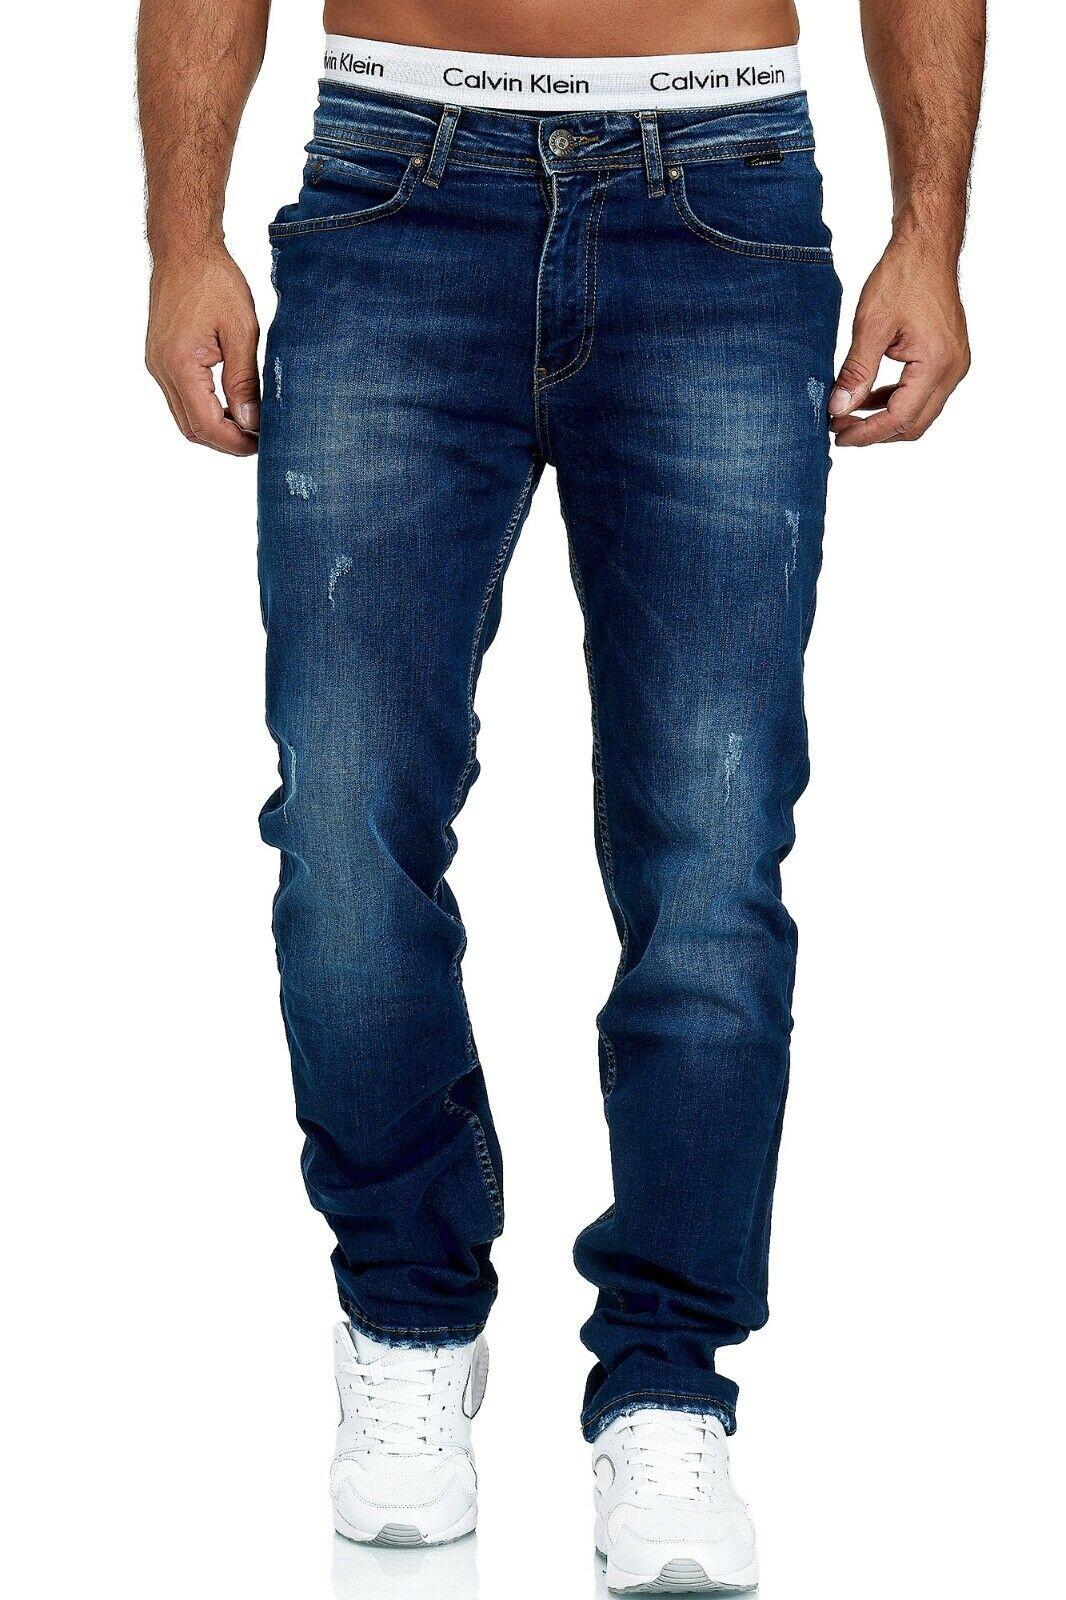 Herren-Jeans-Hose-Denim-KC-Black-Washed-Straight-Cut-Regular-Dicke-Naht-naehte Indexbild 56